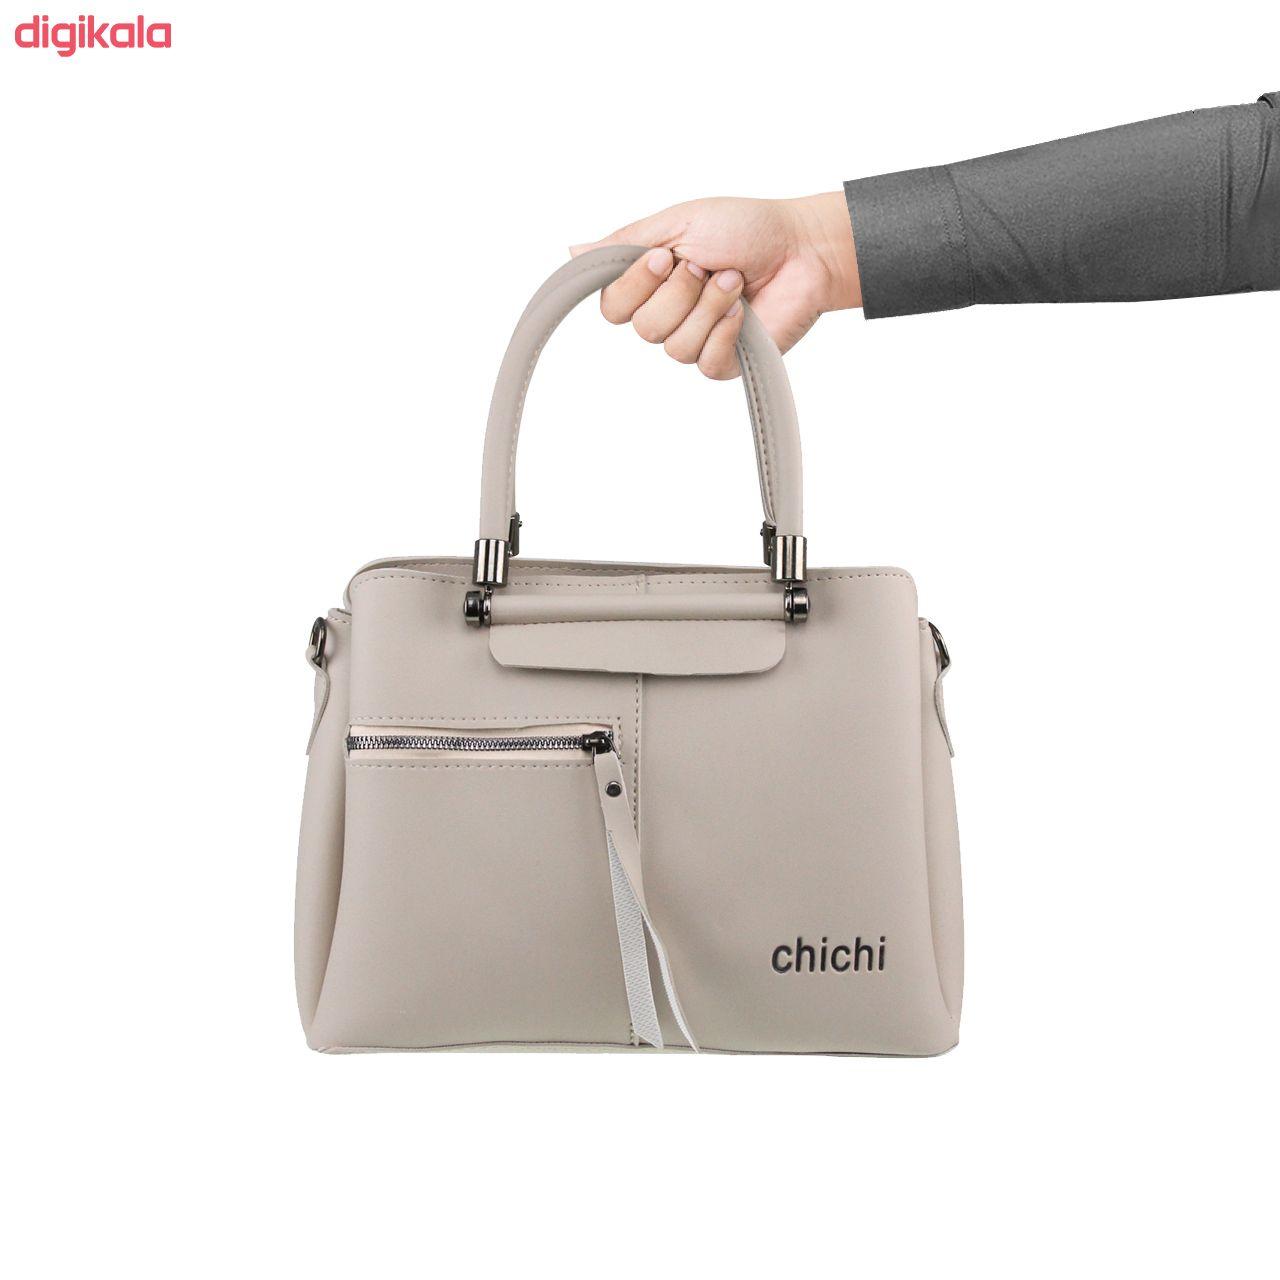 کیف دستی زنانه مدل آدرینا main 1 3